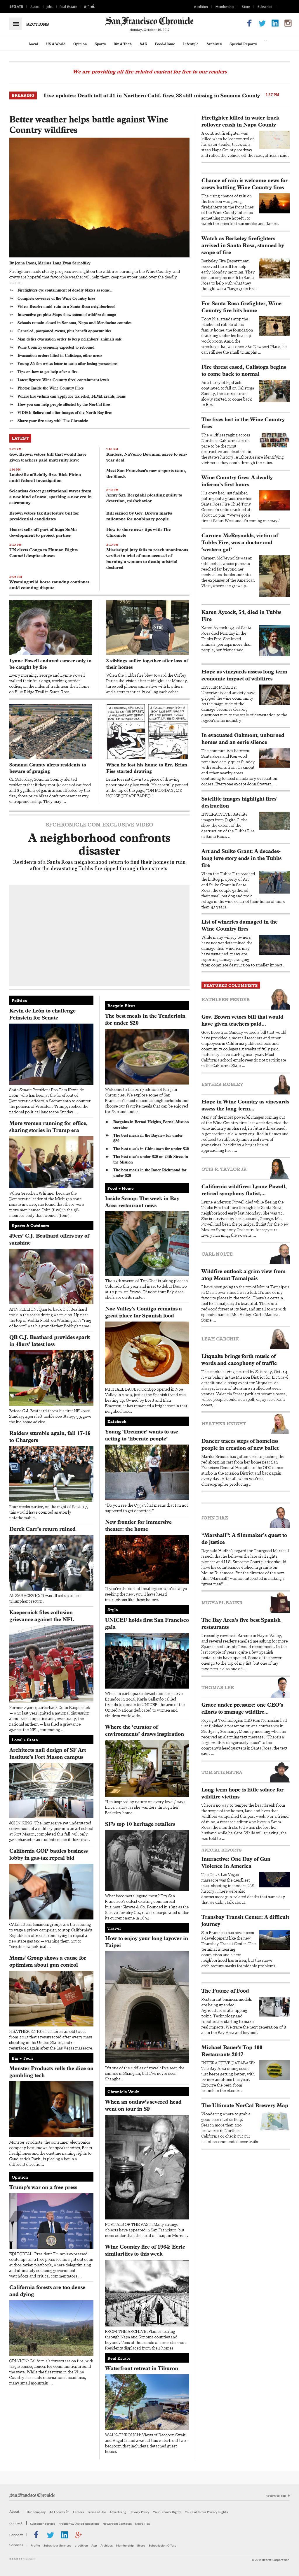 San Francisco Chronicle at Monday Oct. 16, 2017, 9:14 p.m. UTC